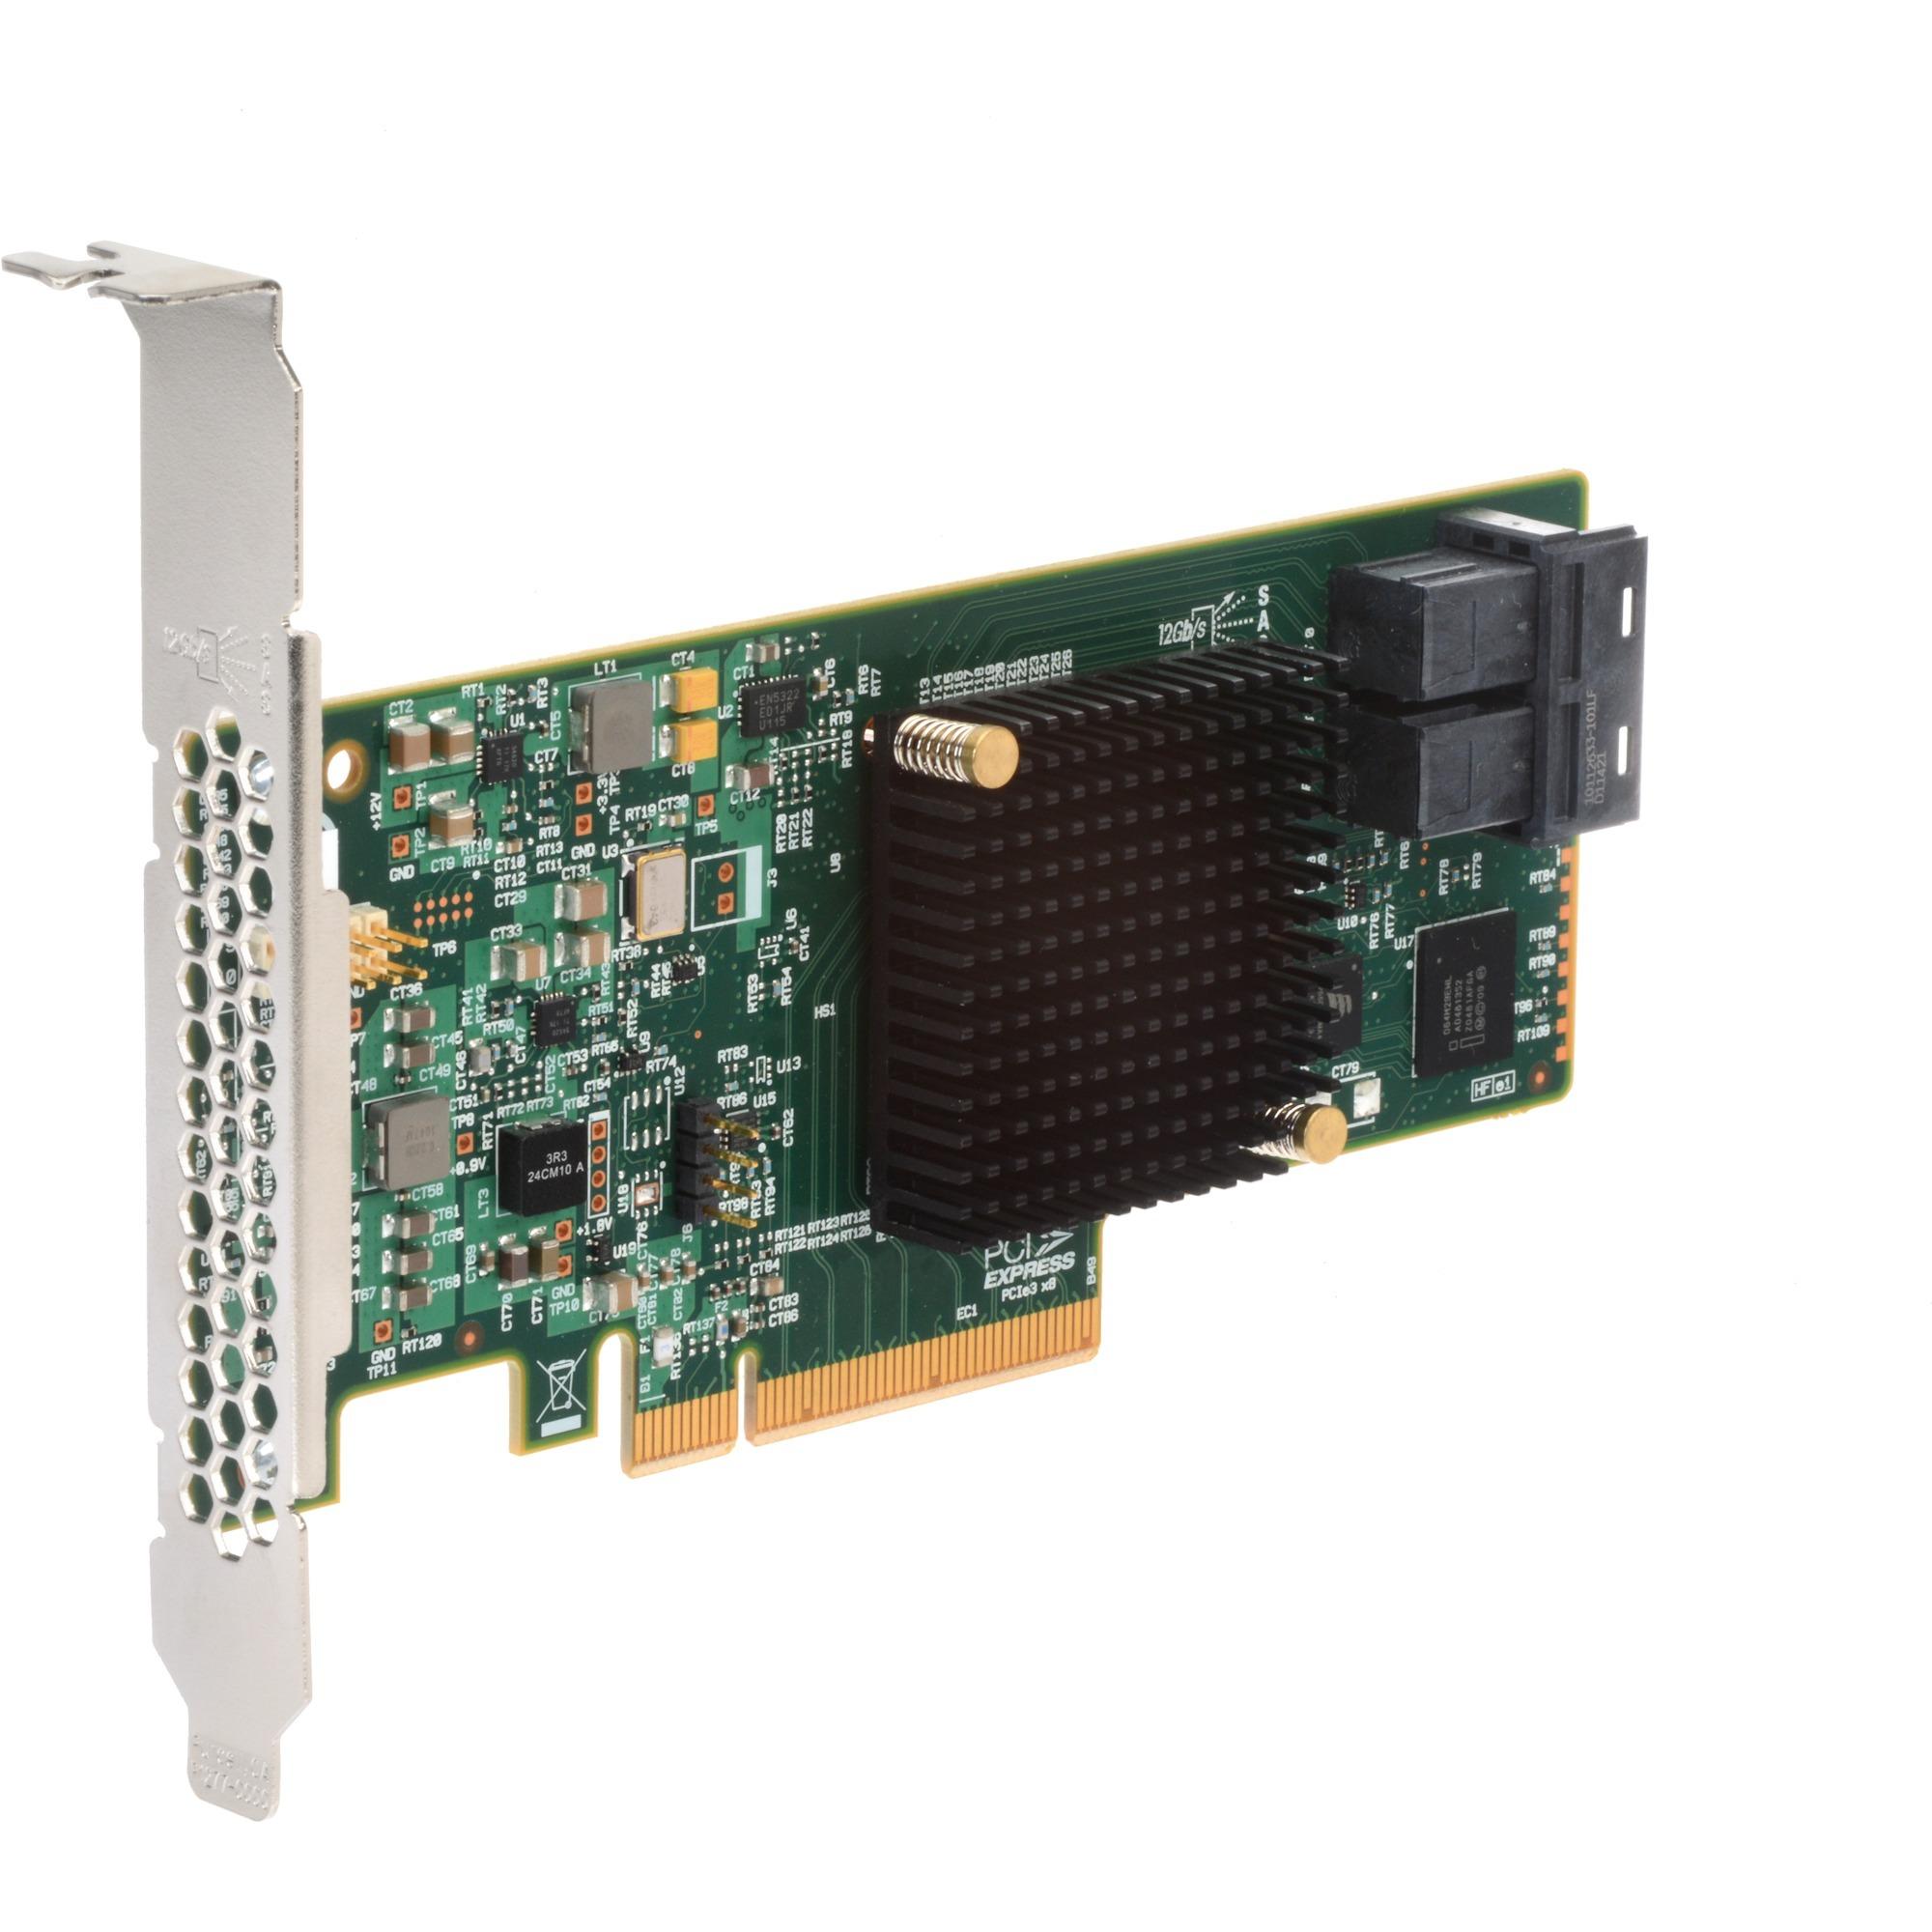 MegaRAID SAS 9341-8i controlado RAID PCI Express x8 3.0 12 Gbit/s, Controlador